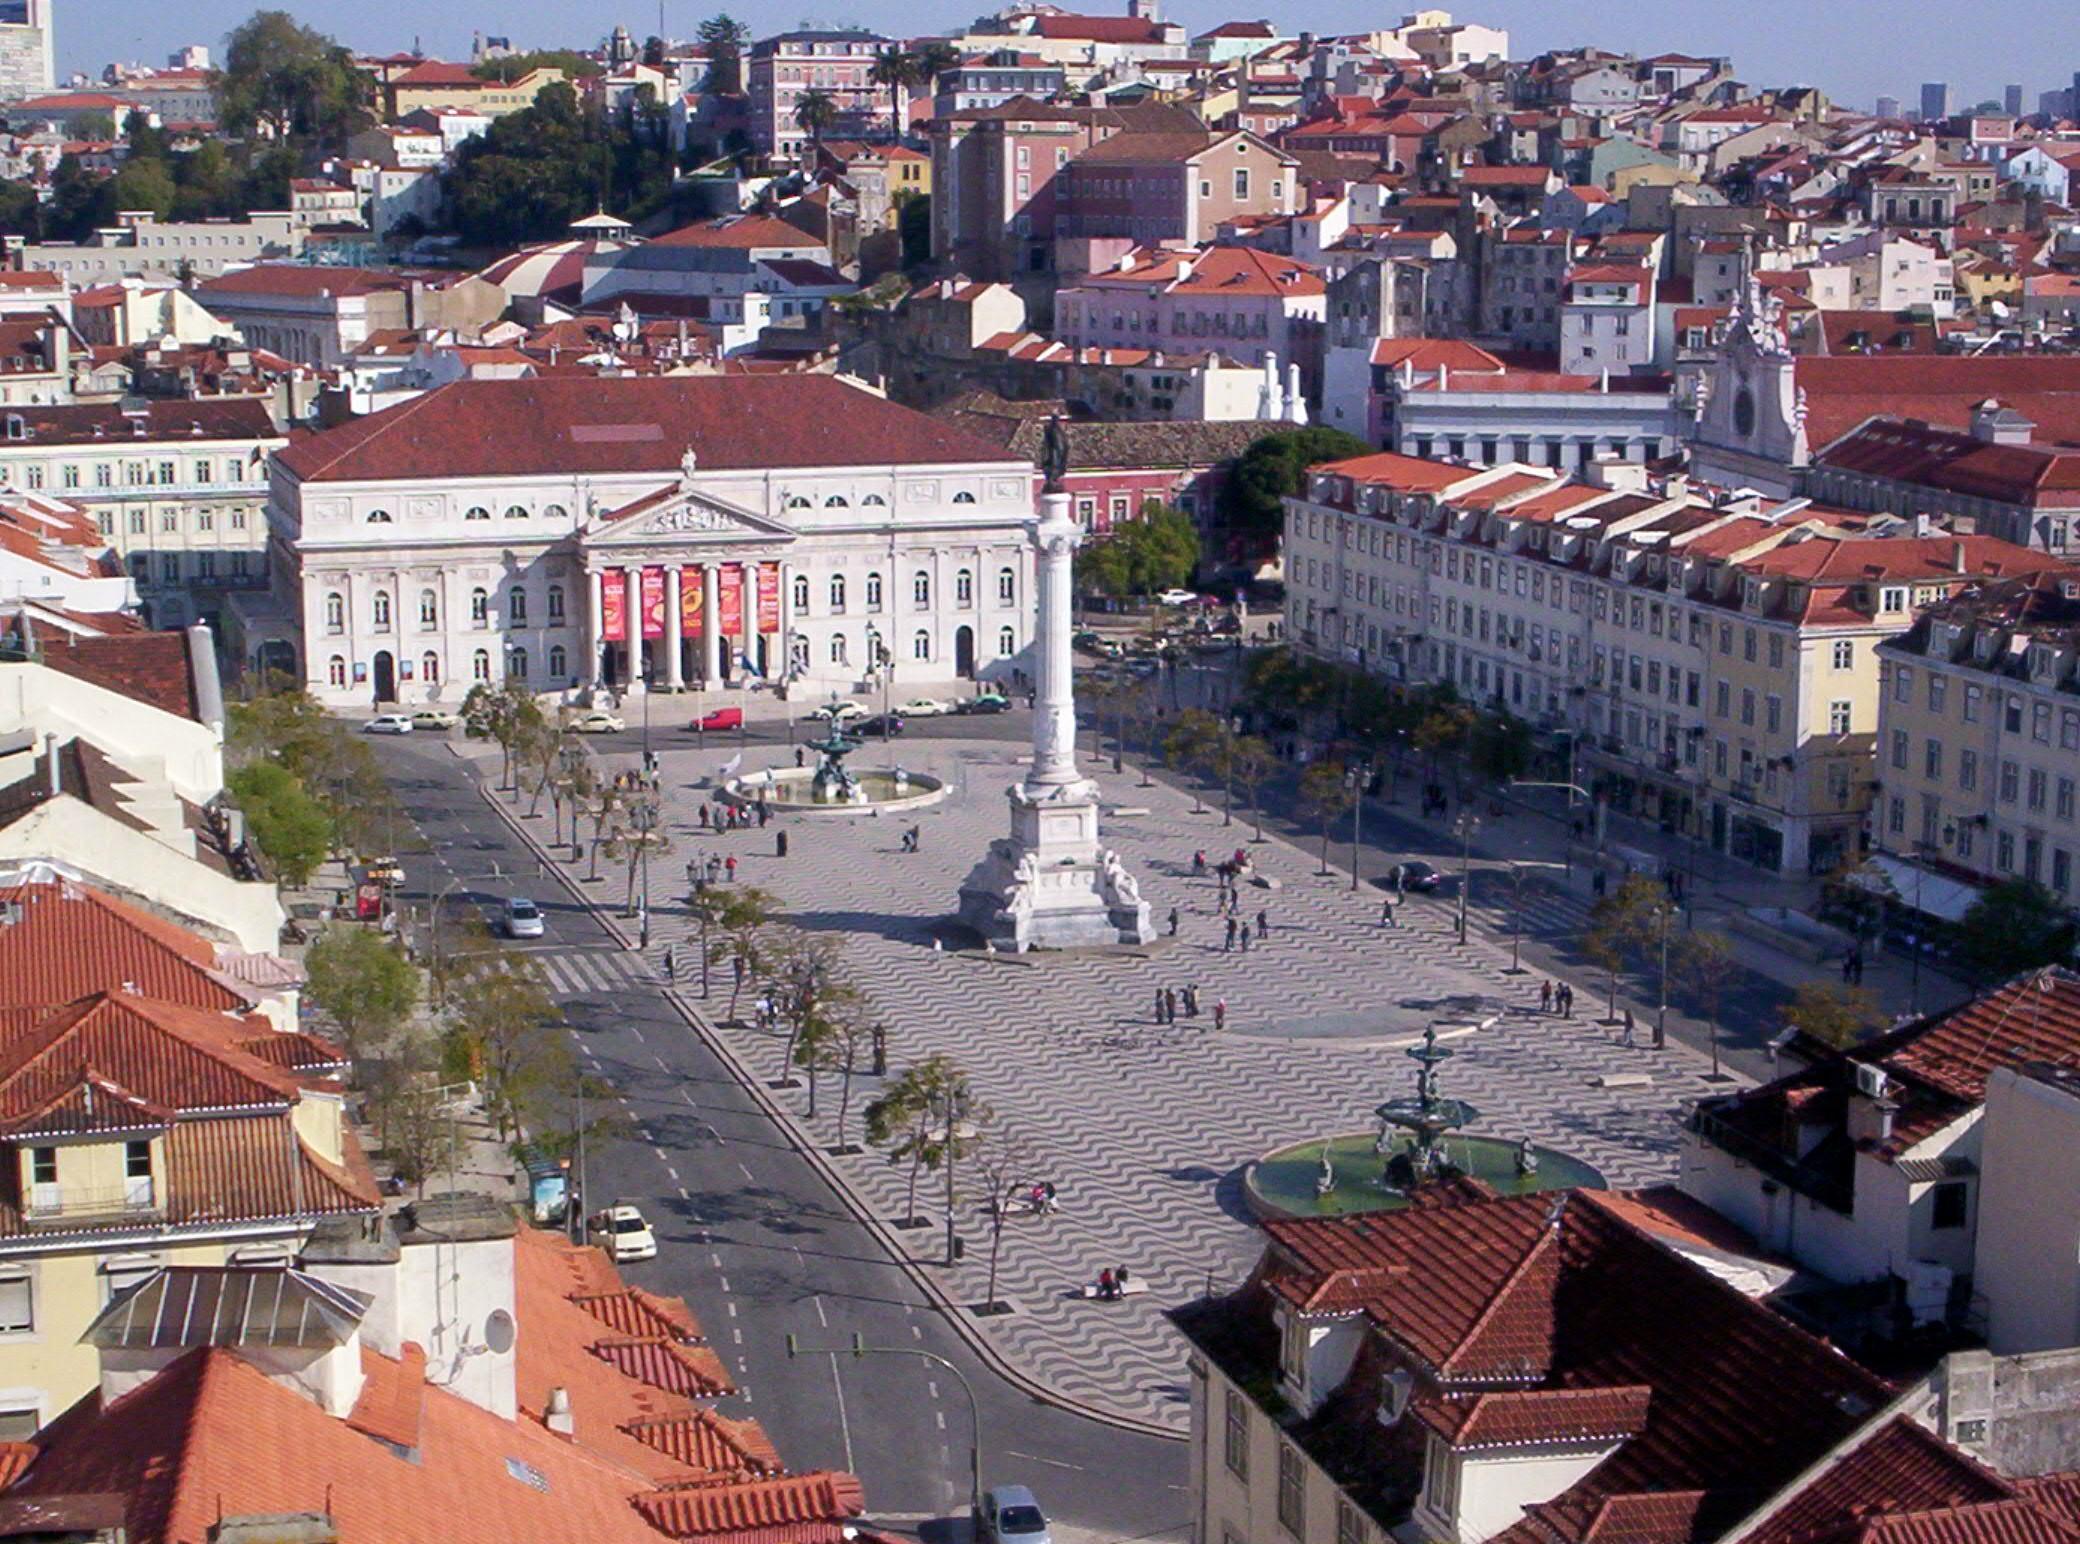 File:Praça Don Pedro IV (Rossio).jpg - Wikimedia Commons